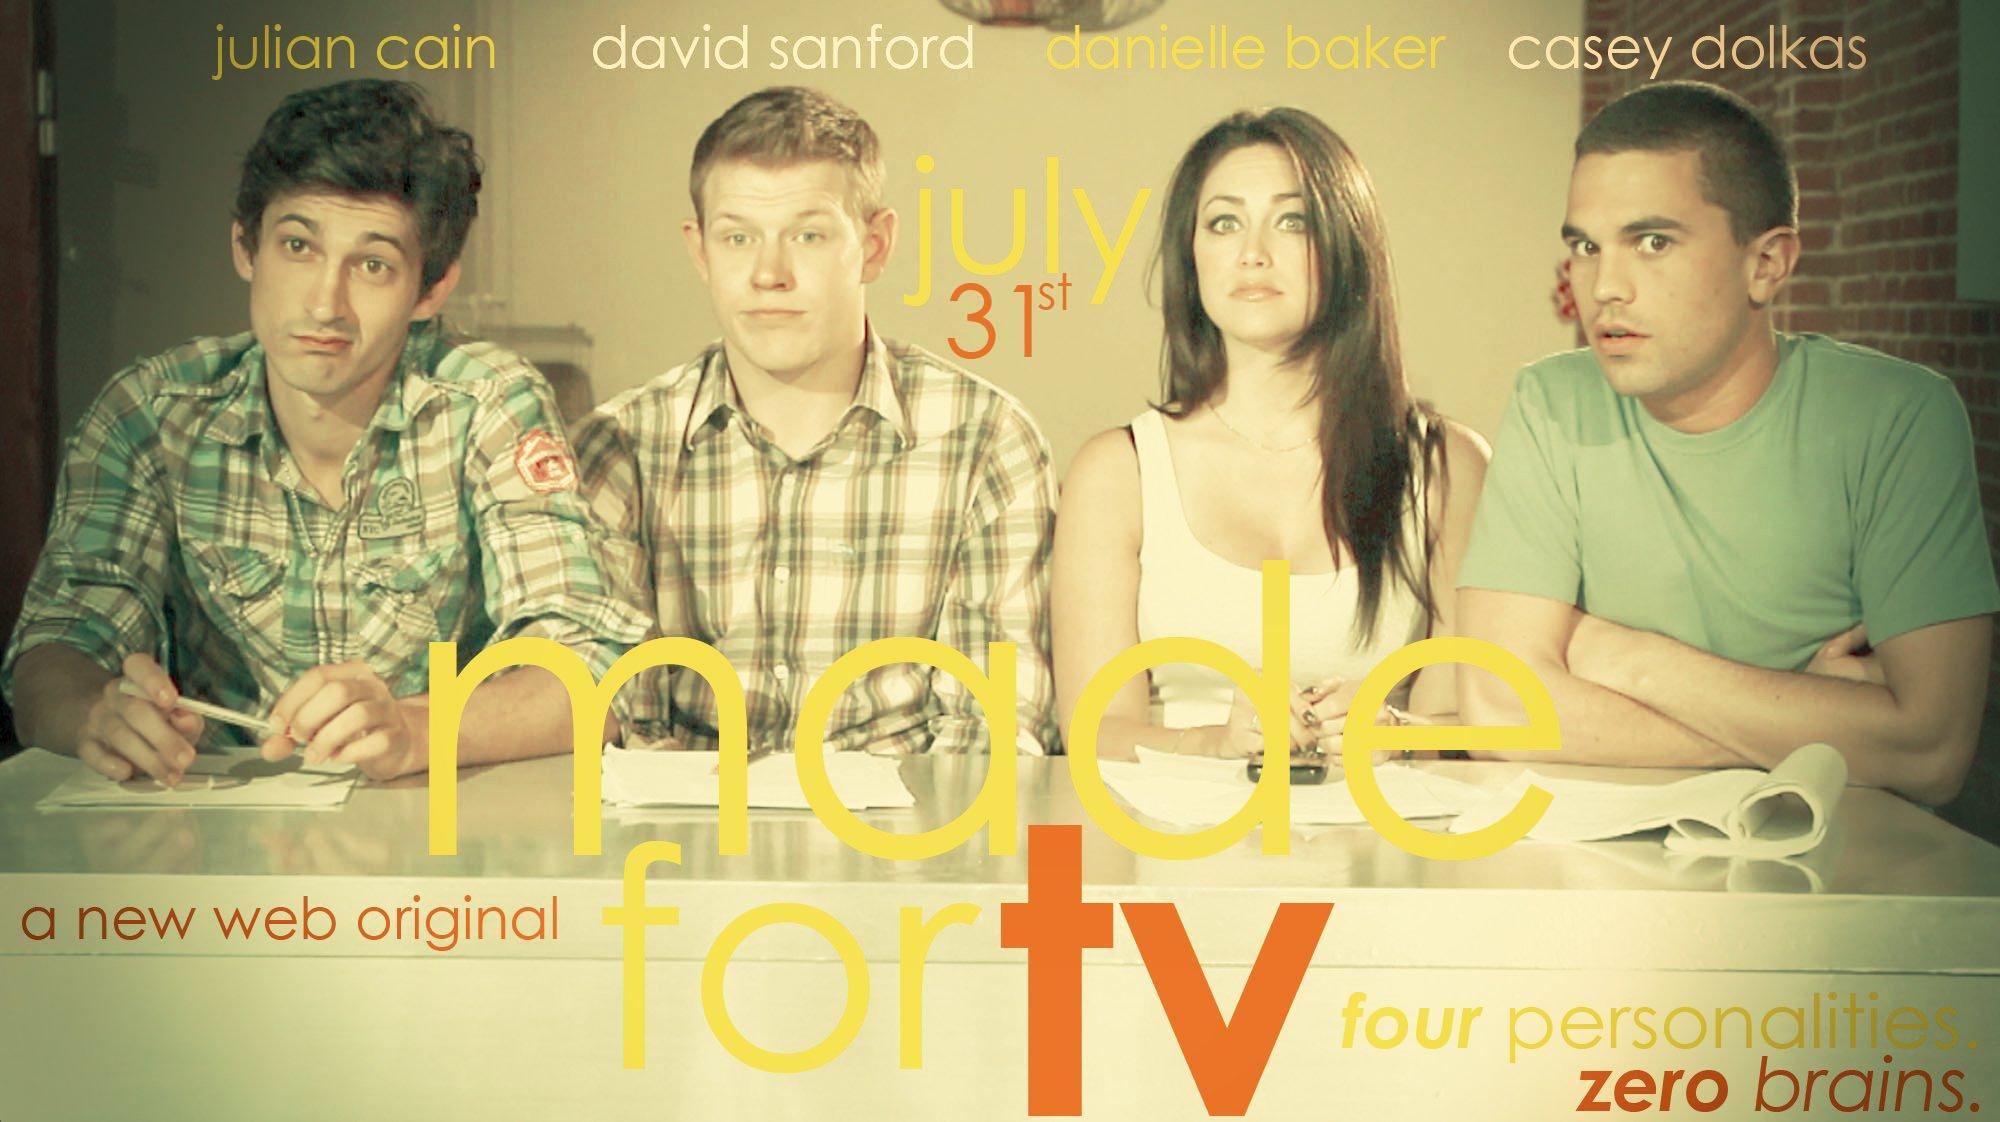 Casey Dolkas, Danielle Baker, and David Sanford in Made for TV (2011)